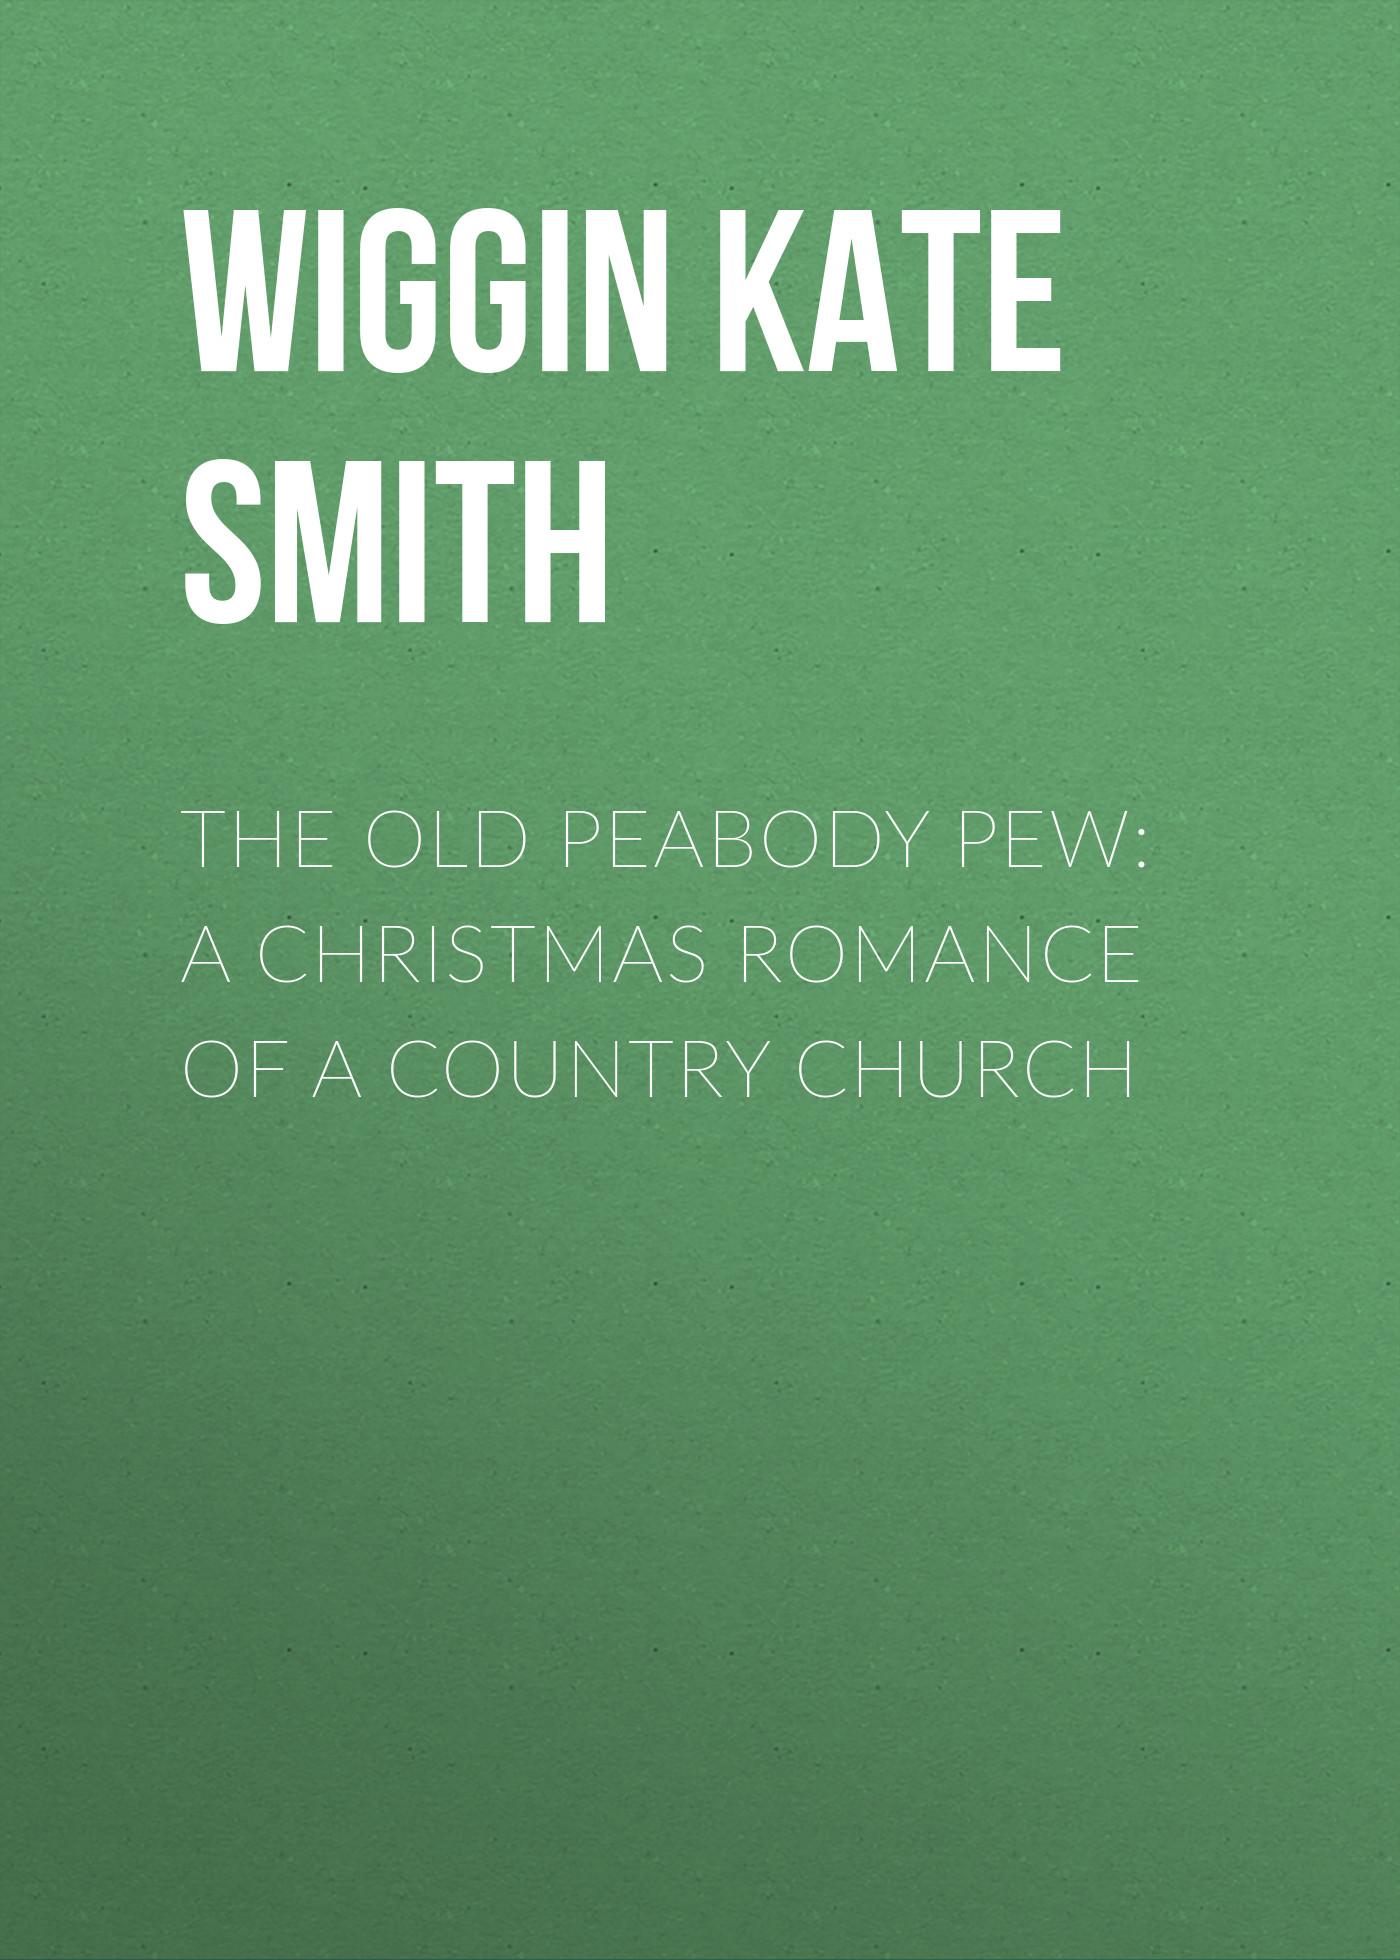 цена на Wiggin Kate Douglas Smith The Old Peabody Pew: A Christmas Romance of a Country Church